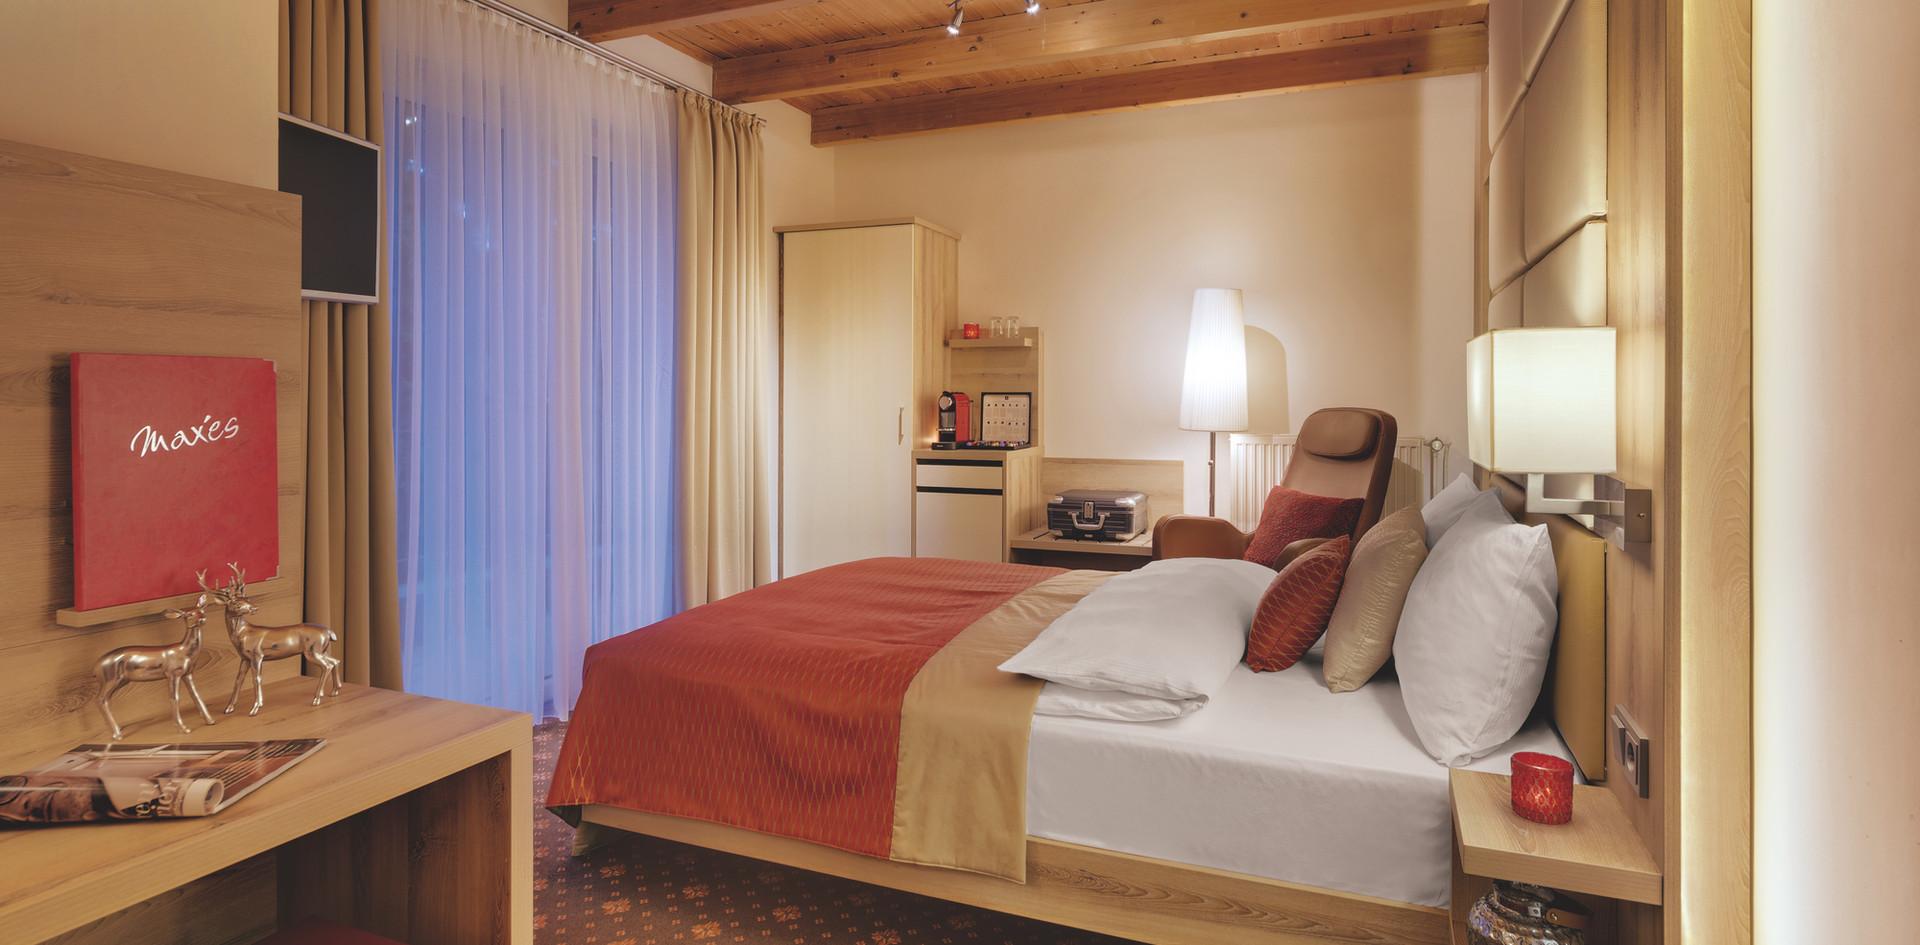 EZ Villa 1 Hotel Wegner - The culinary Art Hotel